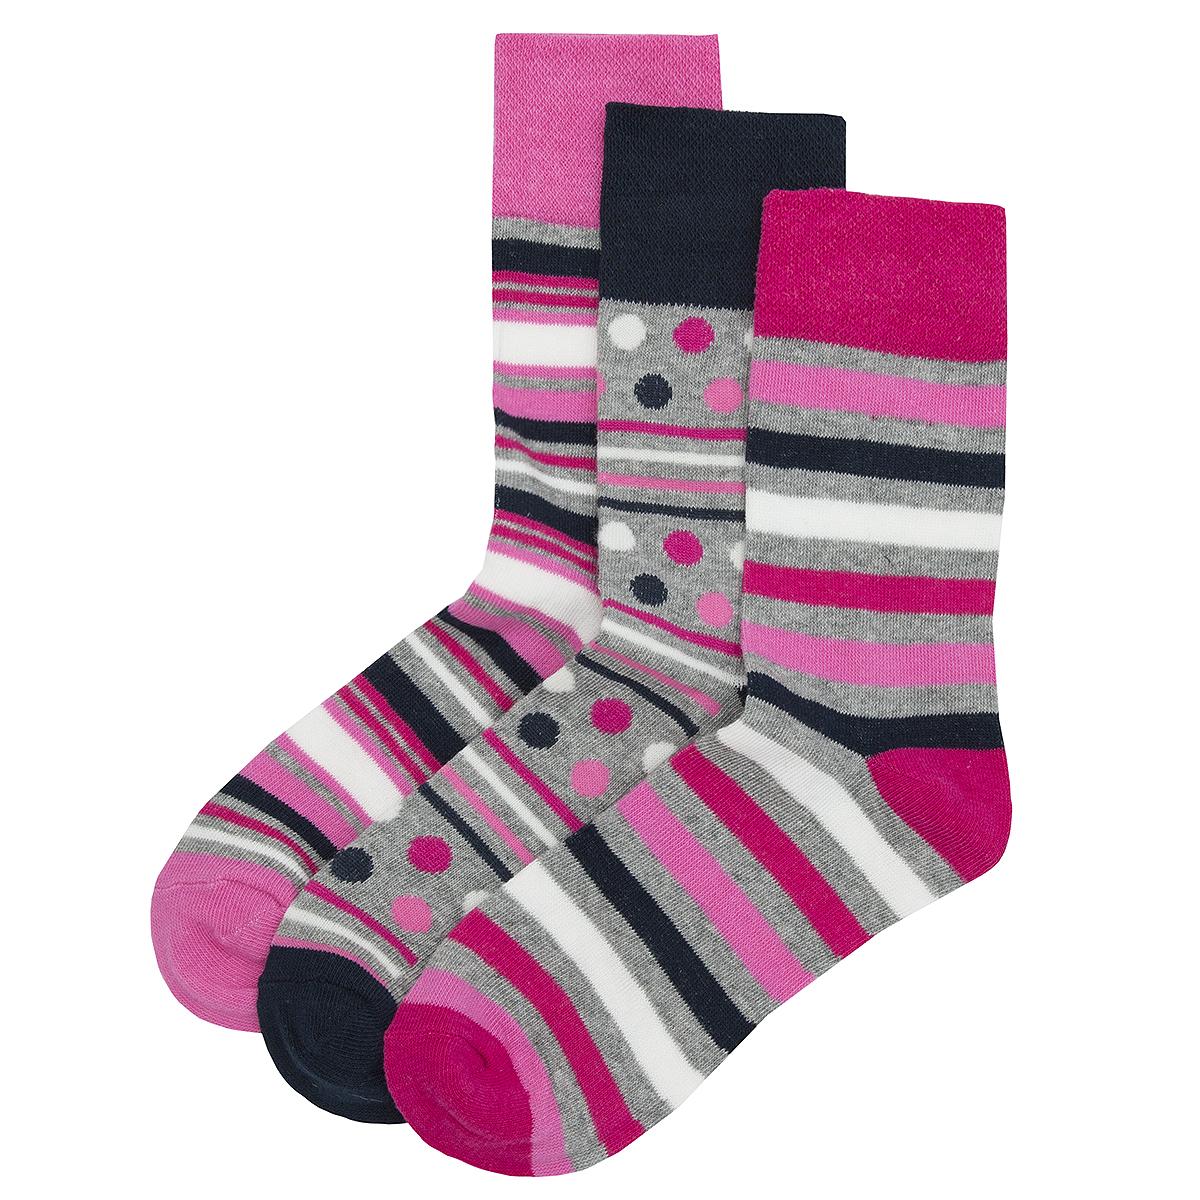 6-12-Pairs-Ladies-Womens-Non-Elastic-Loose-Top-Socks-Grip-Diabetic-Floral-New thumbnail 18